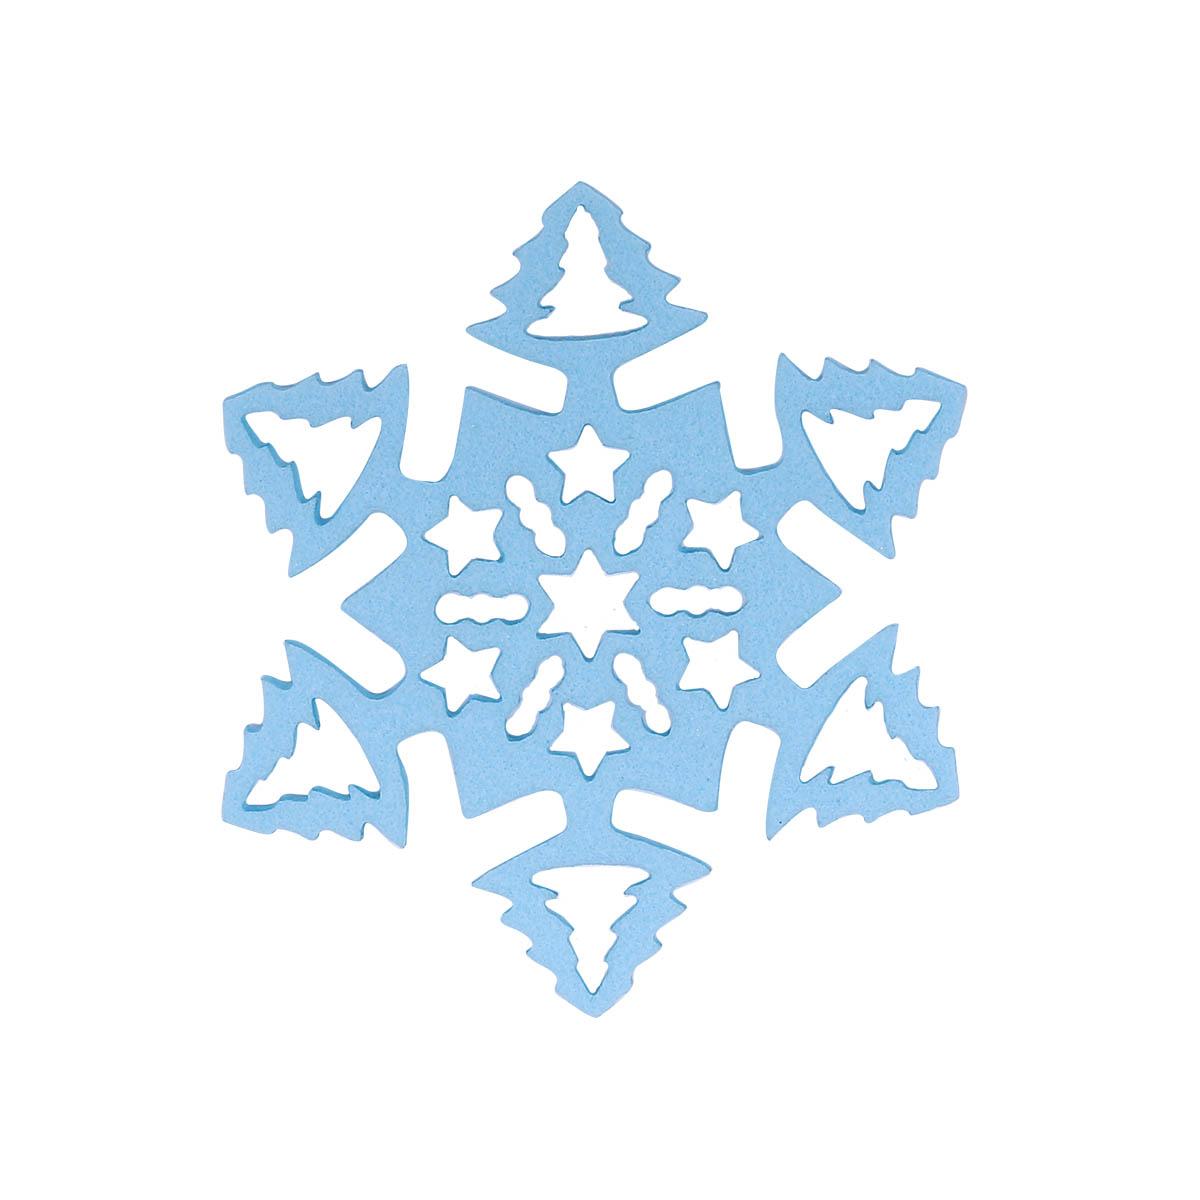 фом19-2 Заготовка из фоамирана 'Снежинка', 5х5 см,10шт